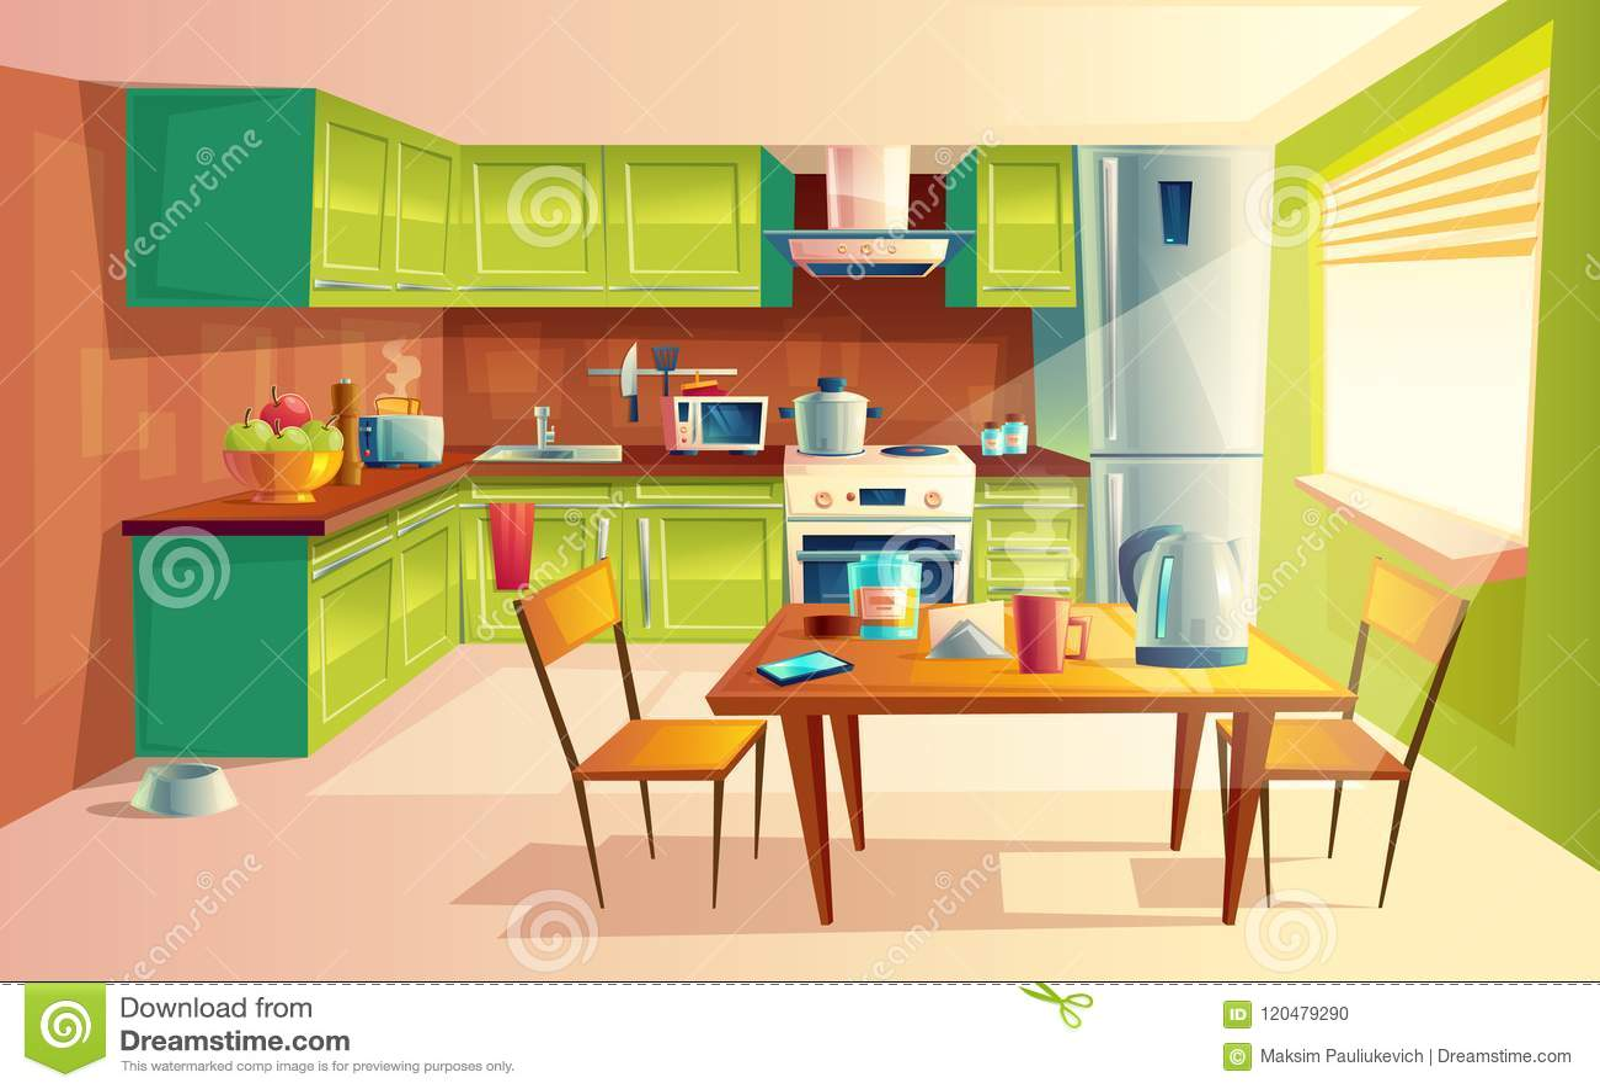 kitchen builder app thermofoil cabinets 传染媒介厨房内部的动画片例证向量例证 插画包括有水壶 平面 例证 传染媒介厨房内部的动画片例证